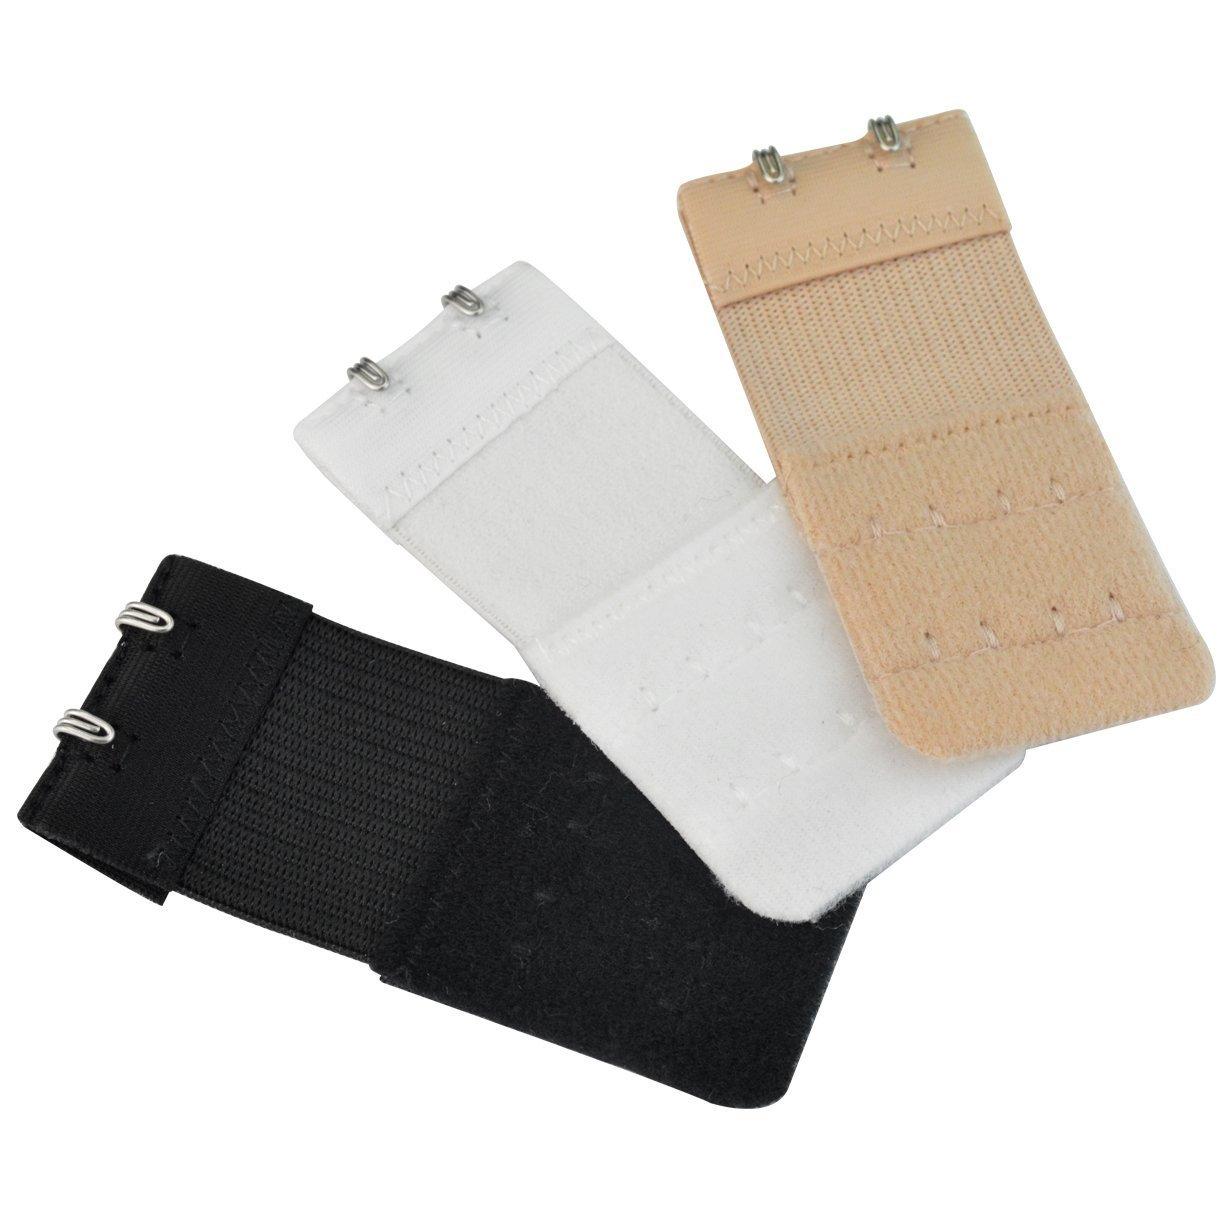 4cdeaa3e2318a Qingsun 3Pcs Bra Extender Elastic Hook Bra Strap Extension at Amazon  Women s Clothing store